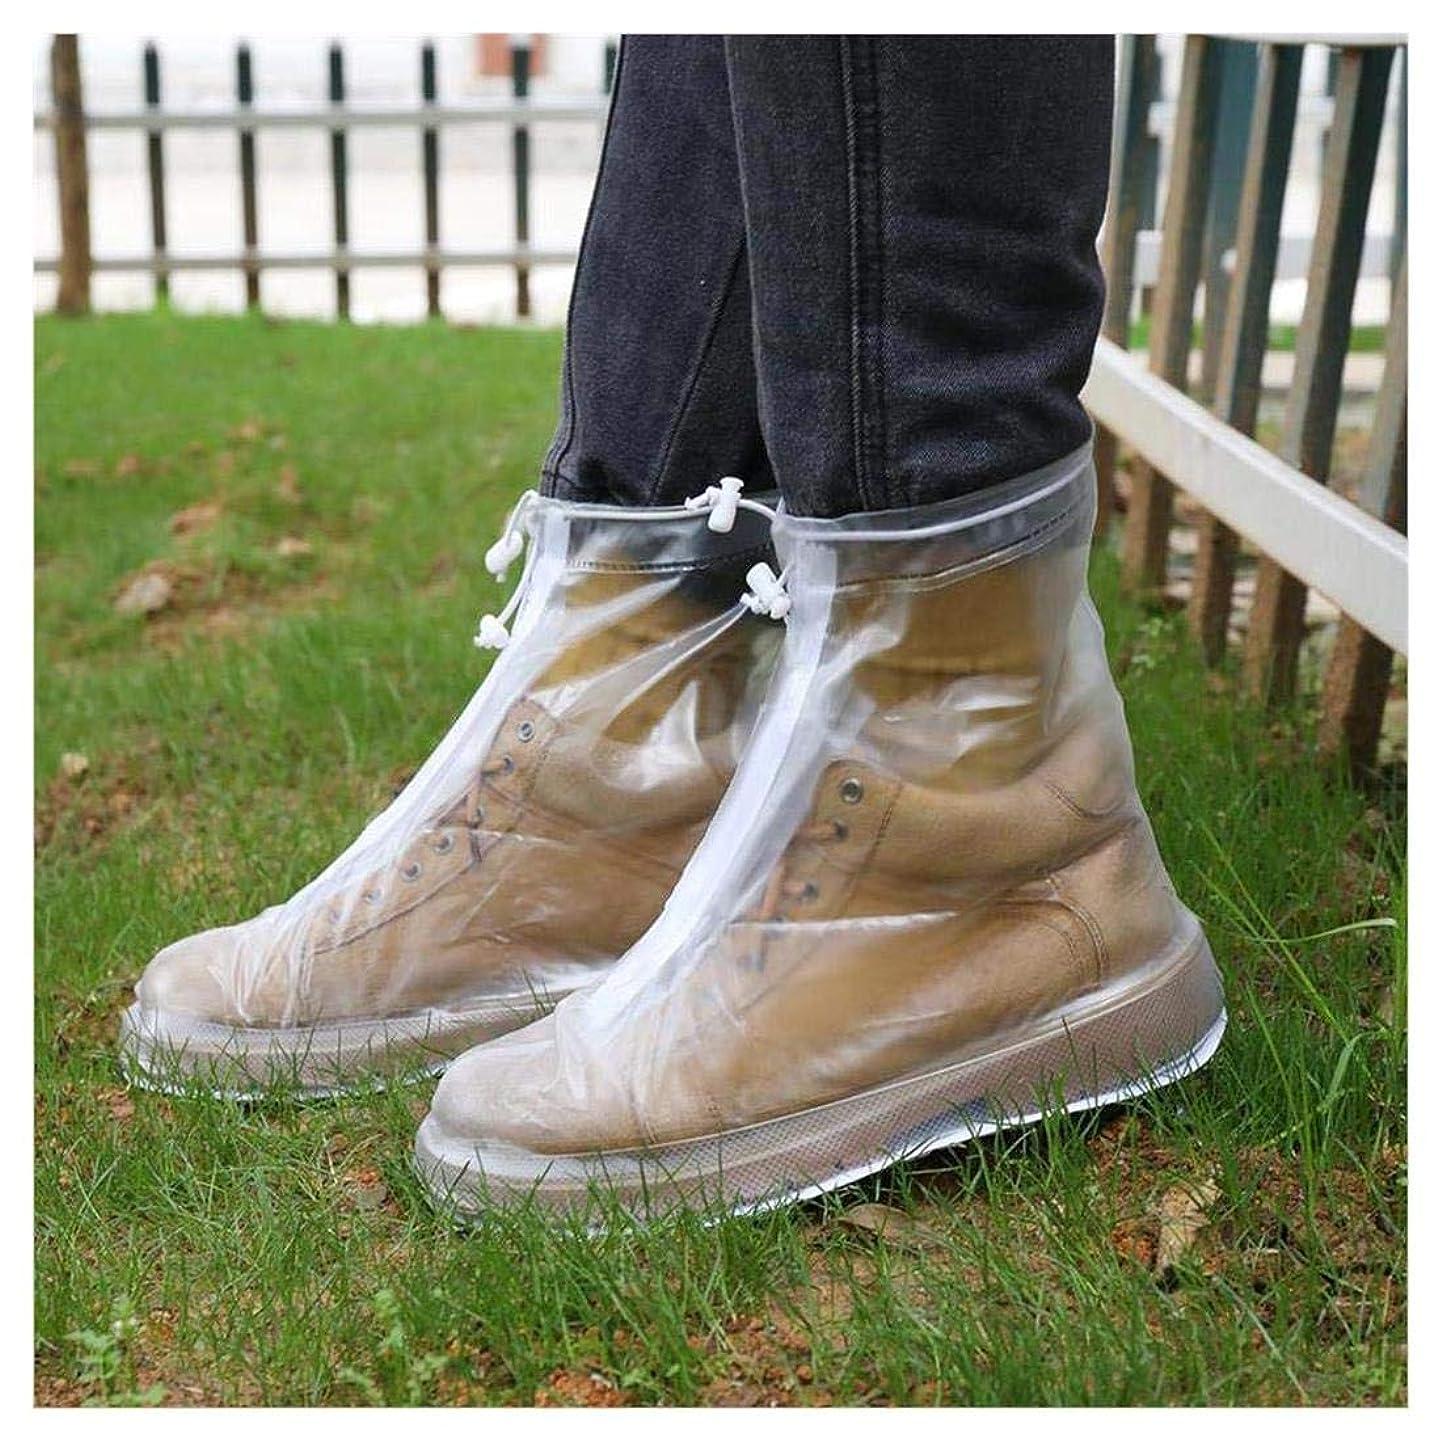 Rain Boot Waterproof Shoes Cover Women Men Kids Reusable PVC Rubber Sole Overshoes Galoshes XXXXL ntoqshrmusk0